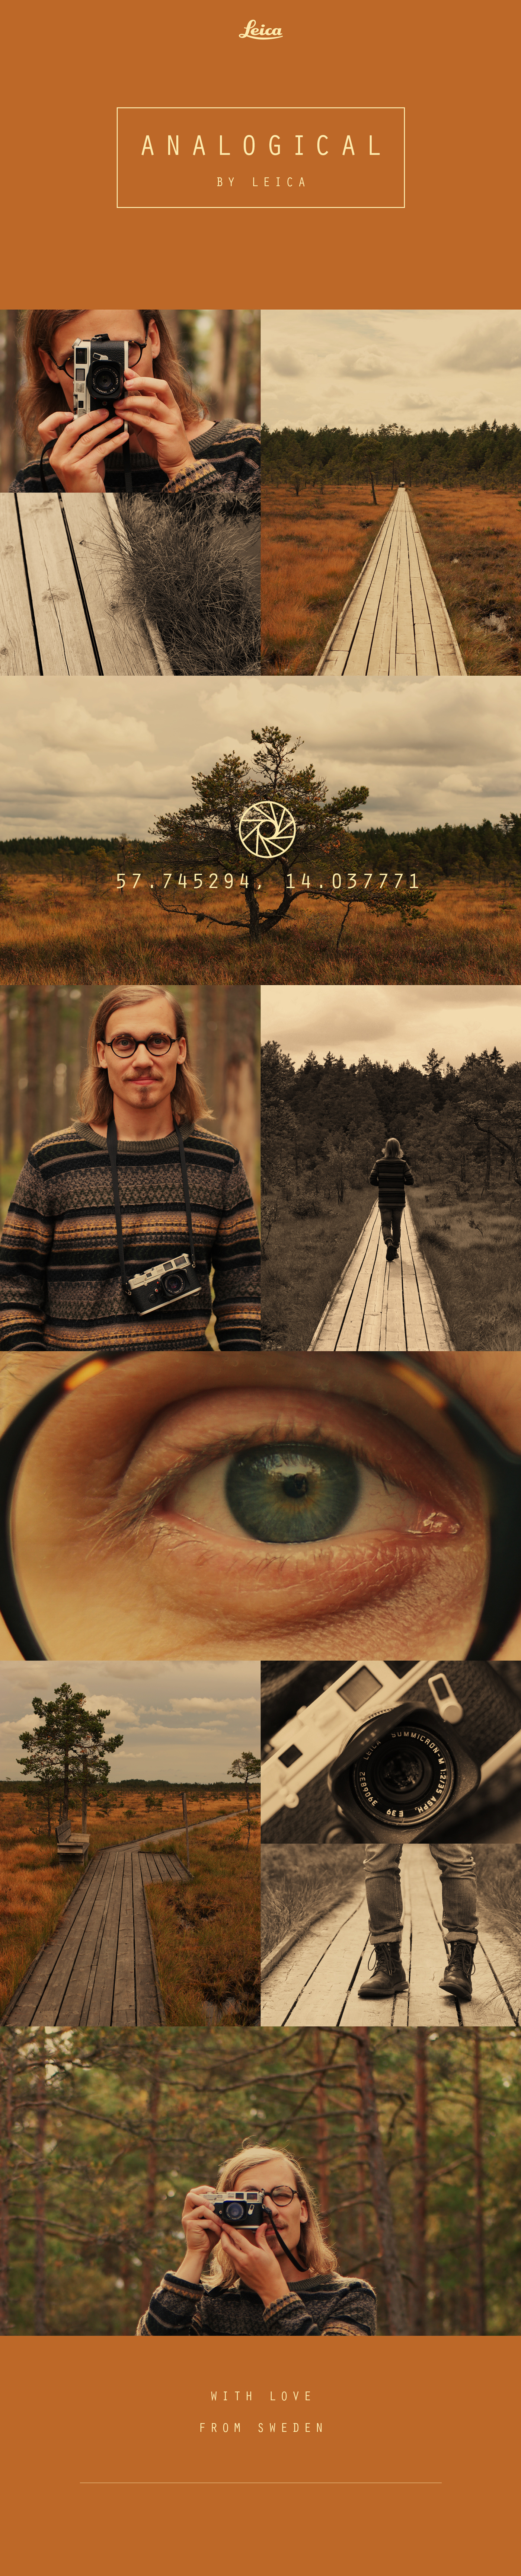 photo,Leica,Analogical,analogic,camera,branding